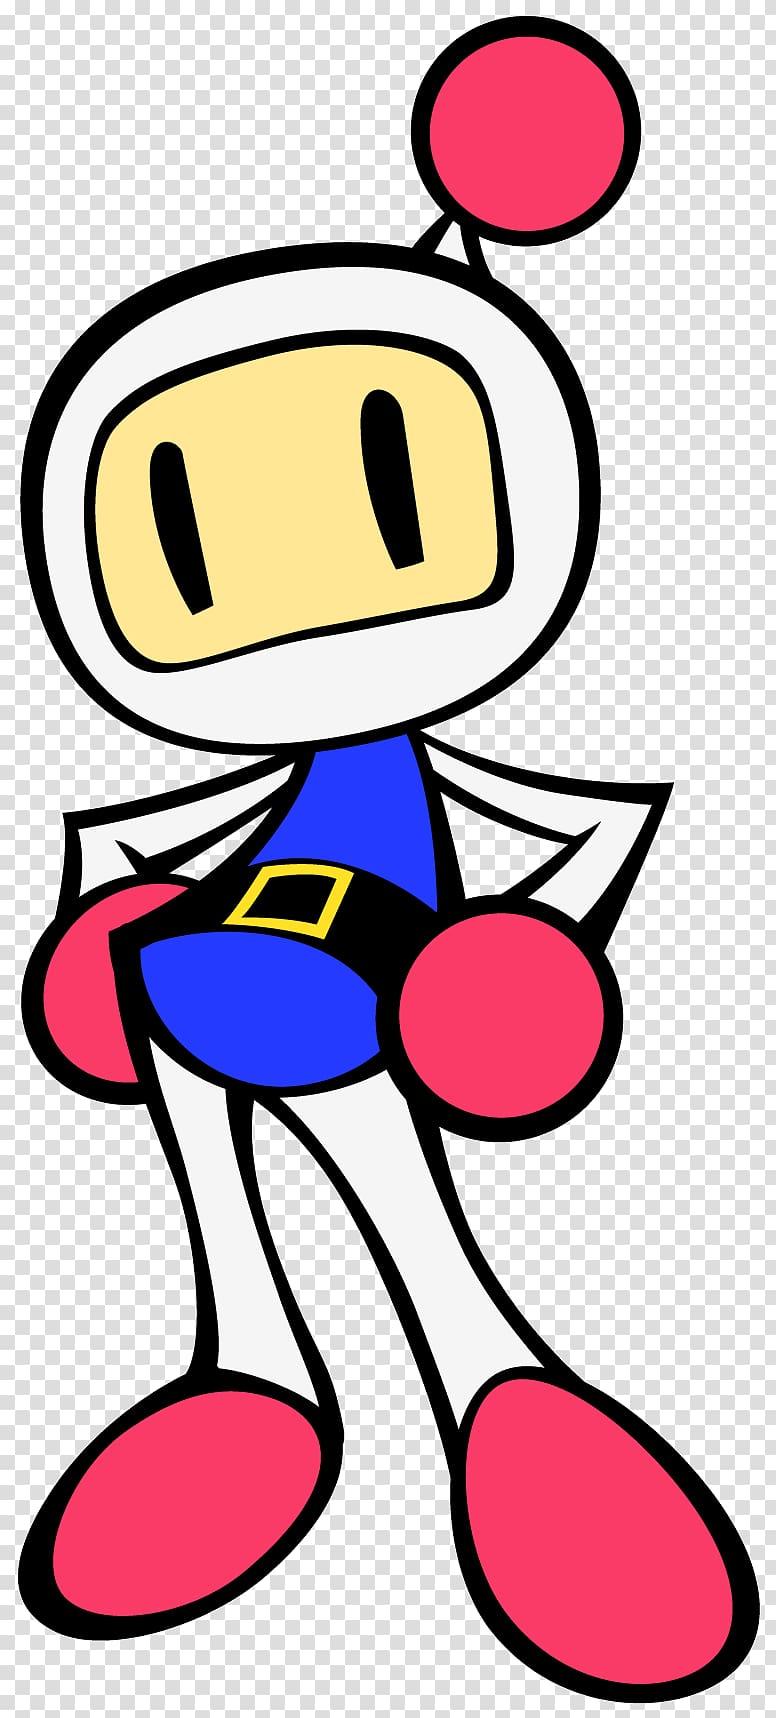 Super Bomberman R Bomberman Hero Video game, black man.